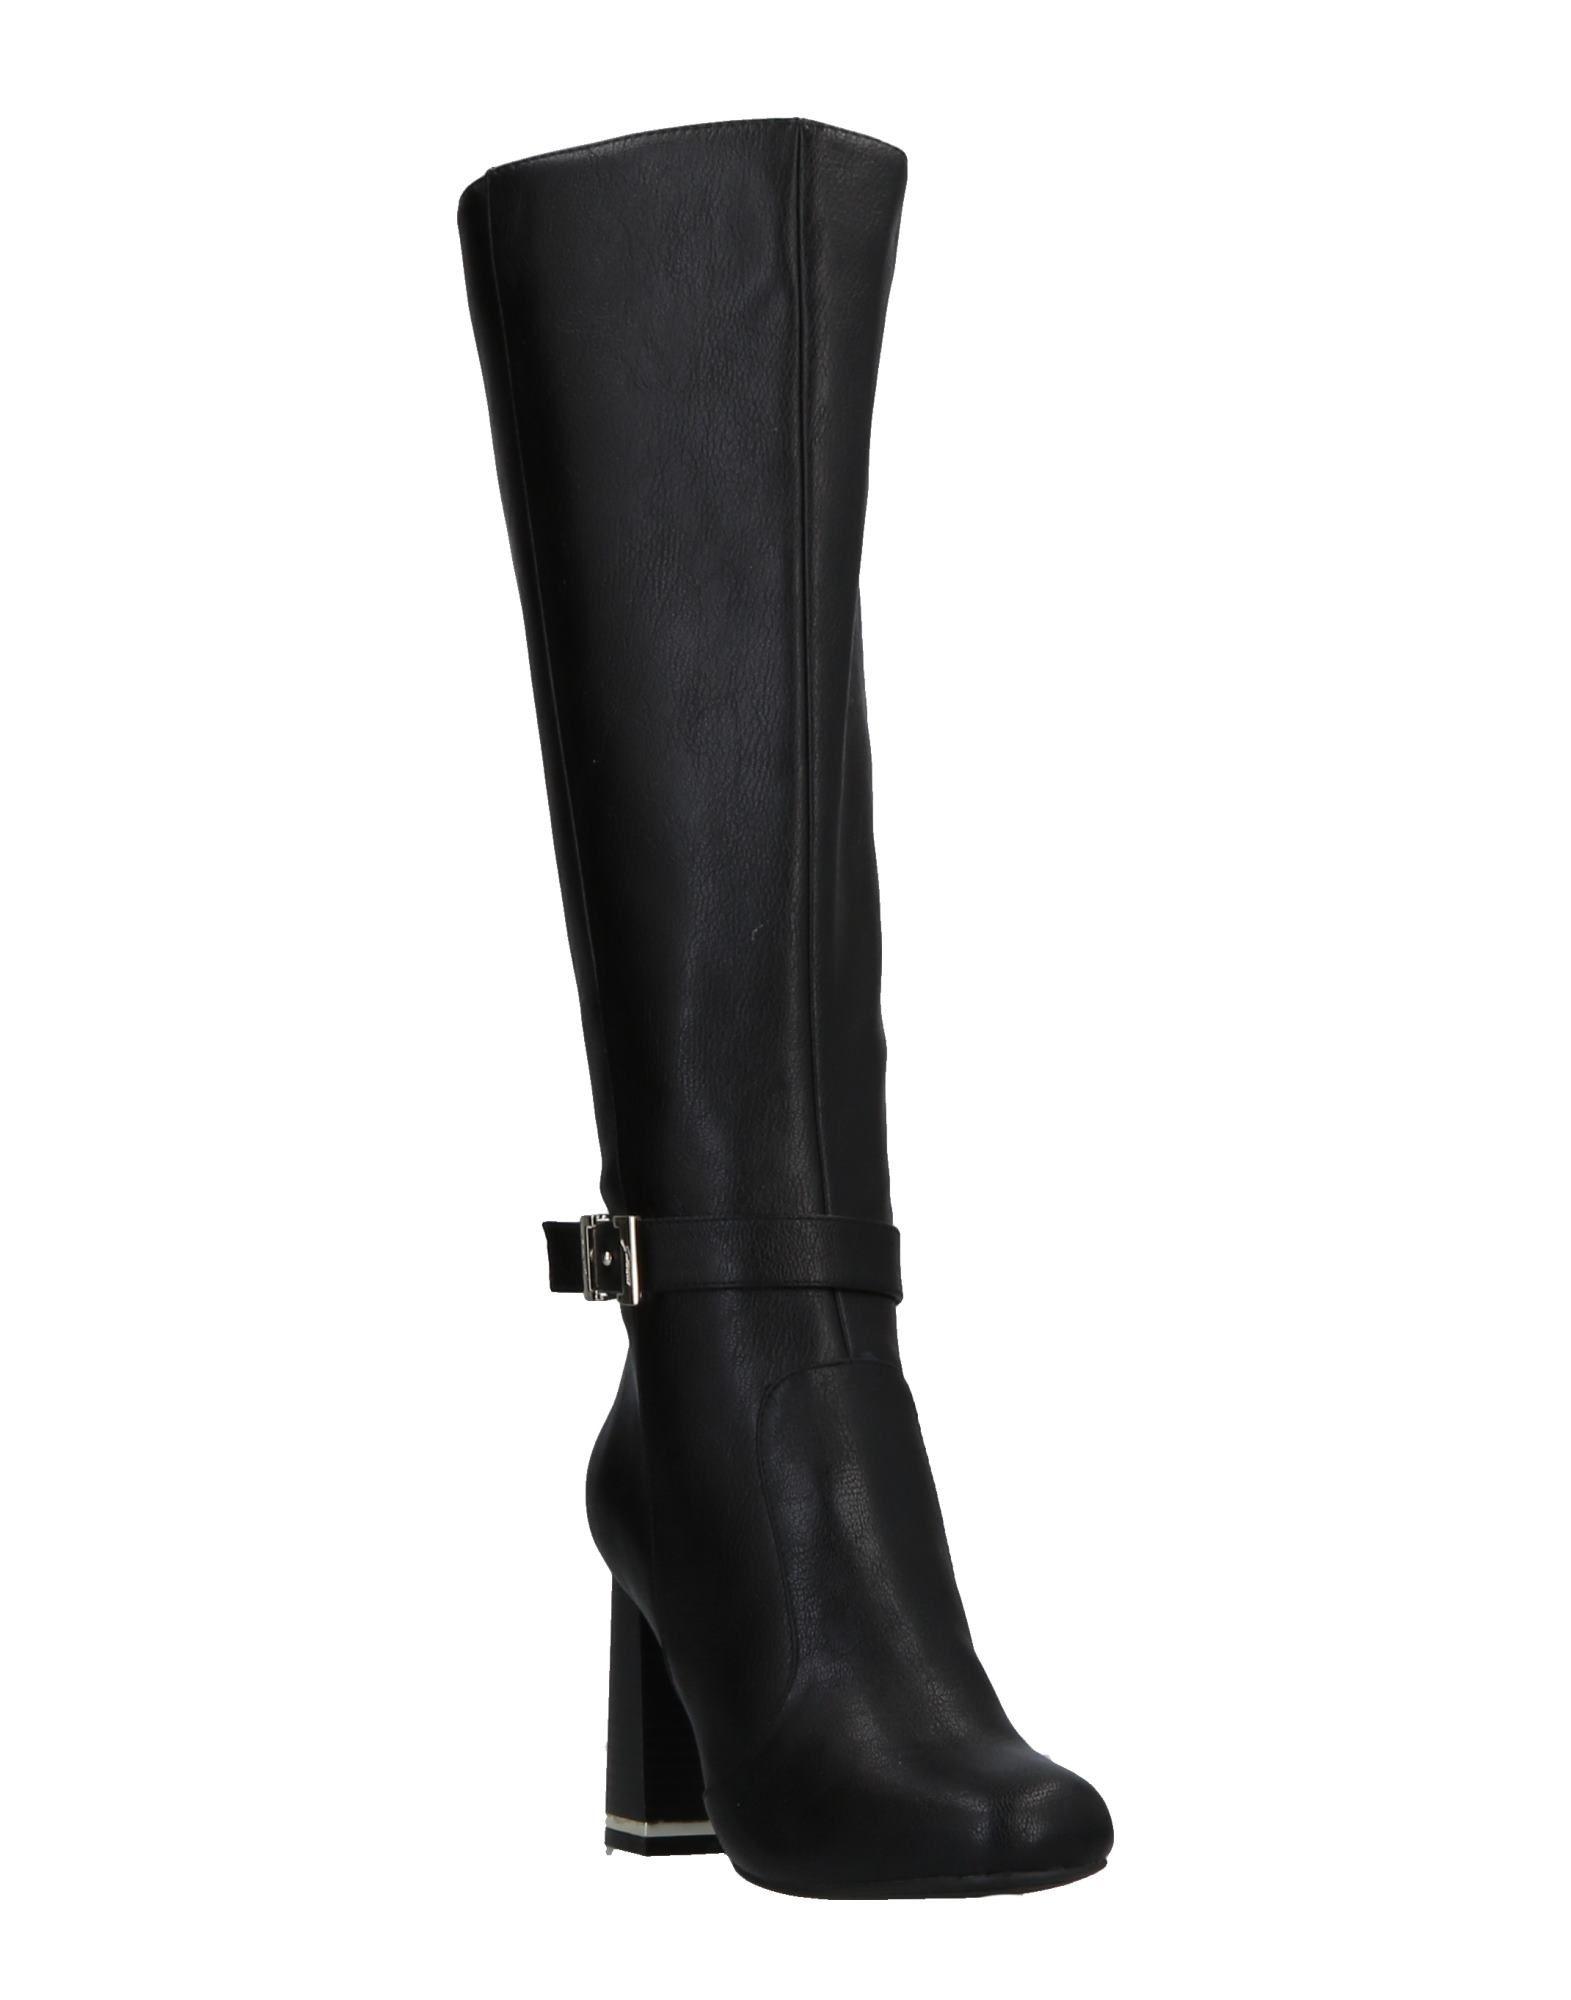 42435a805c92 ... Gattinoni Stiefel Damen beliebte 11517391BP Gute Qualität beliebte  Schuhe 33a39f ...